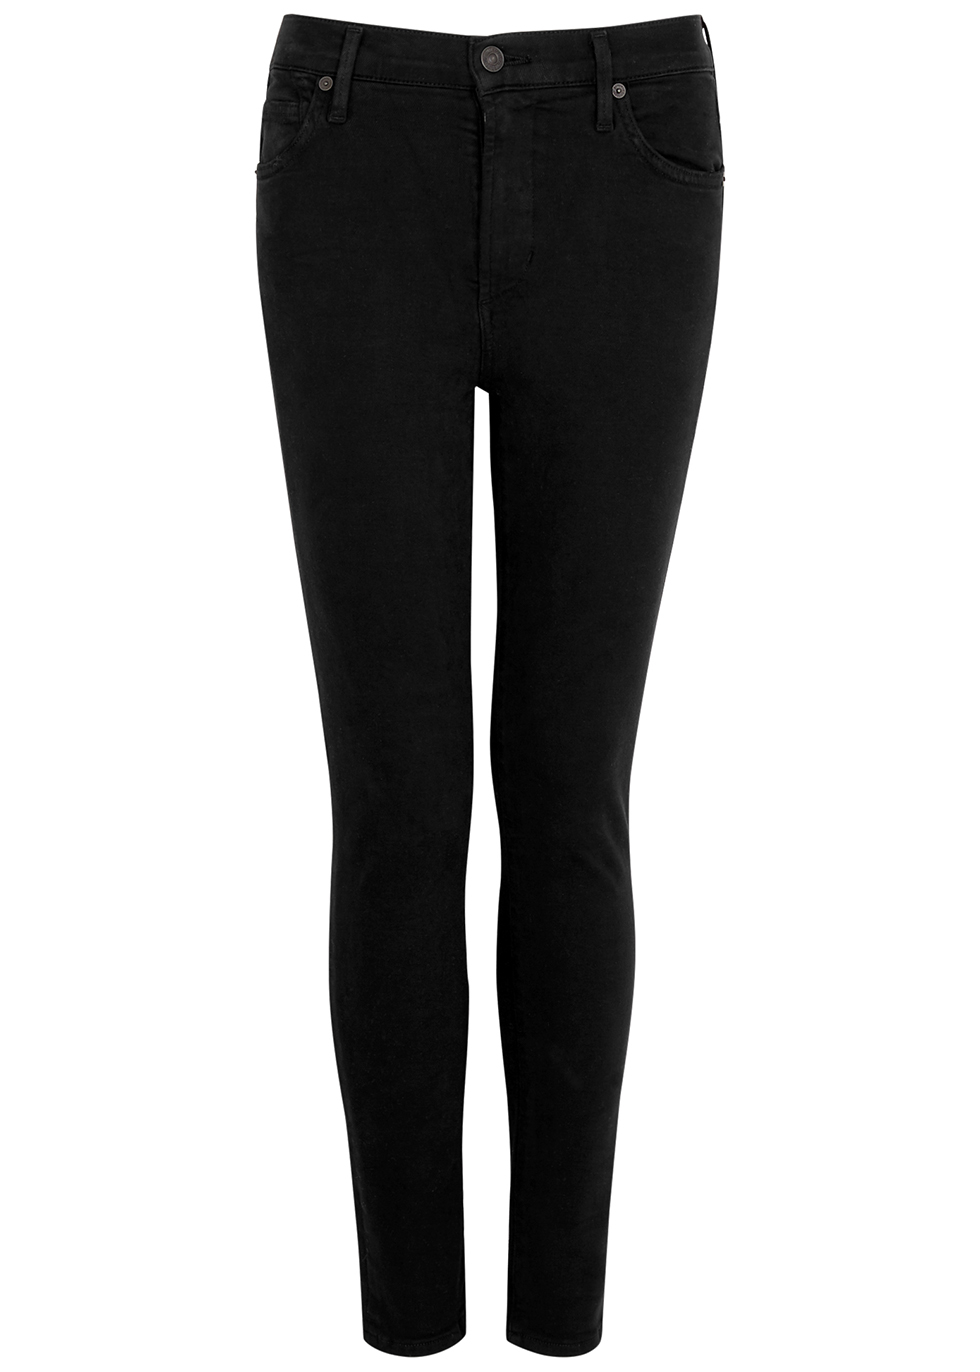 Rocket Ankle black skinny jeans